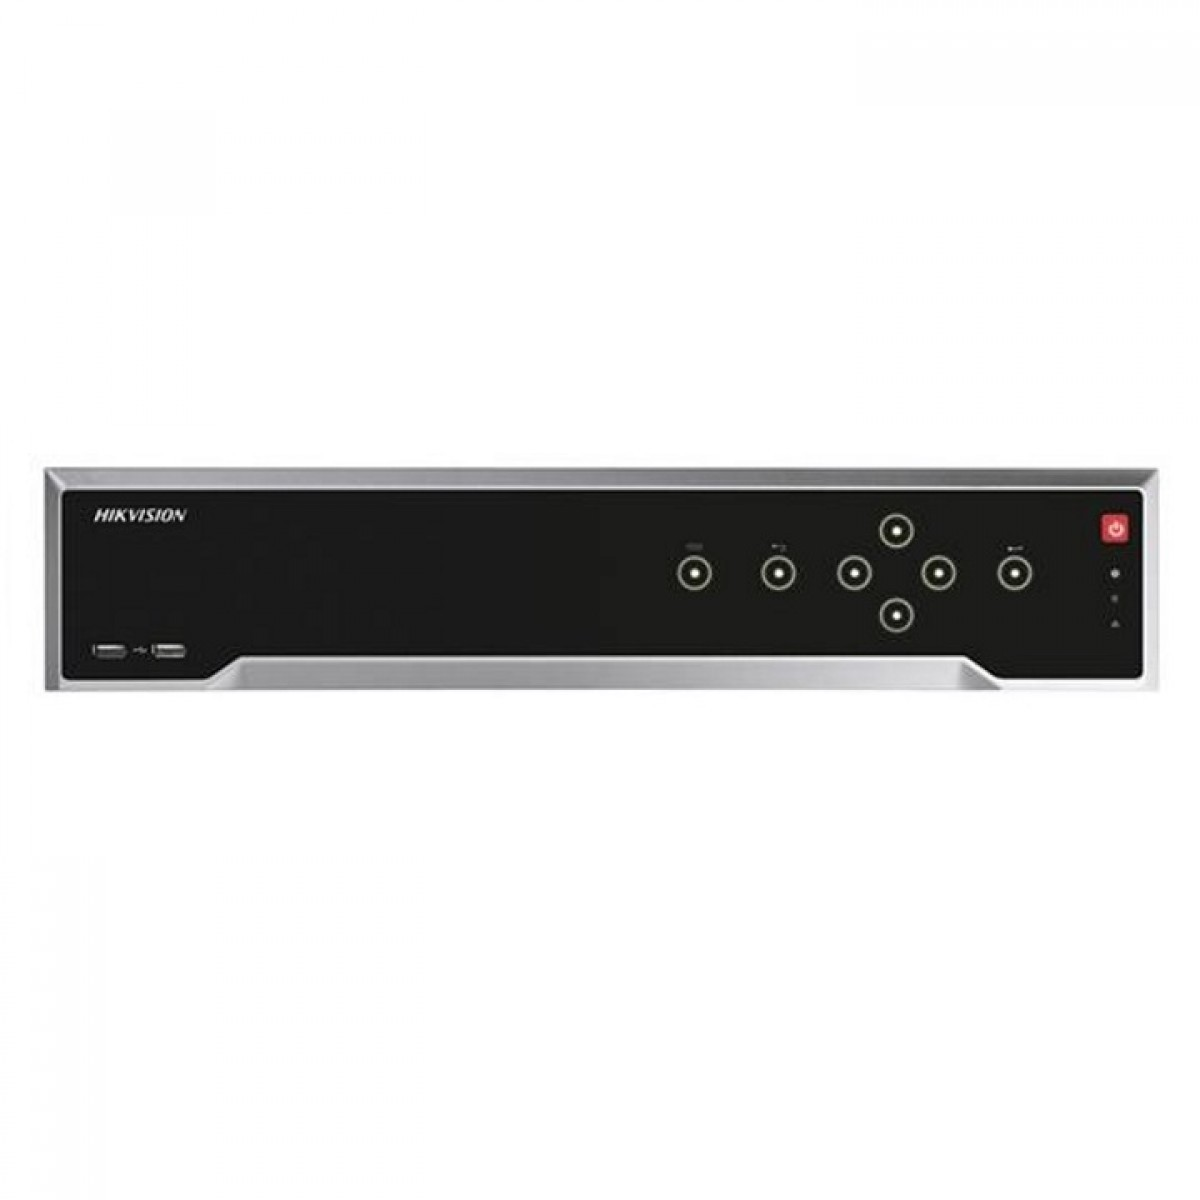 Hikvision DS-7732NI-I4/16P(B) 32 Channel 16 POE 4K UHD 12MP Full Ultra HD 1080P Alarm Full HD Network Video Recorder 1.5U 32CH CCTV